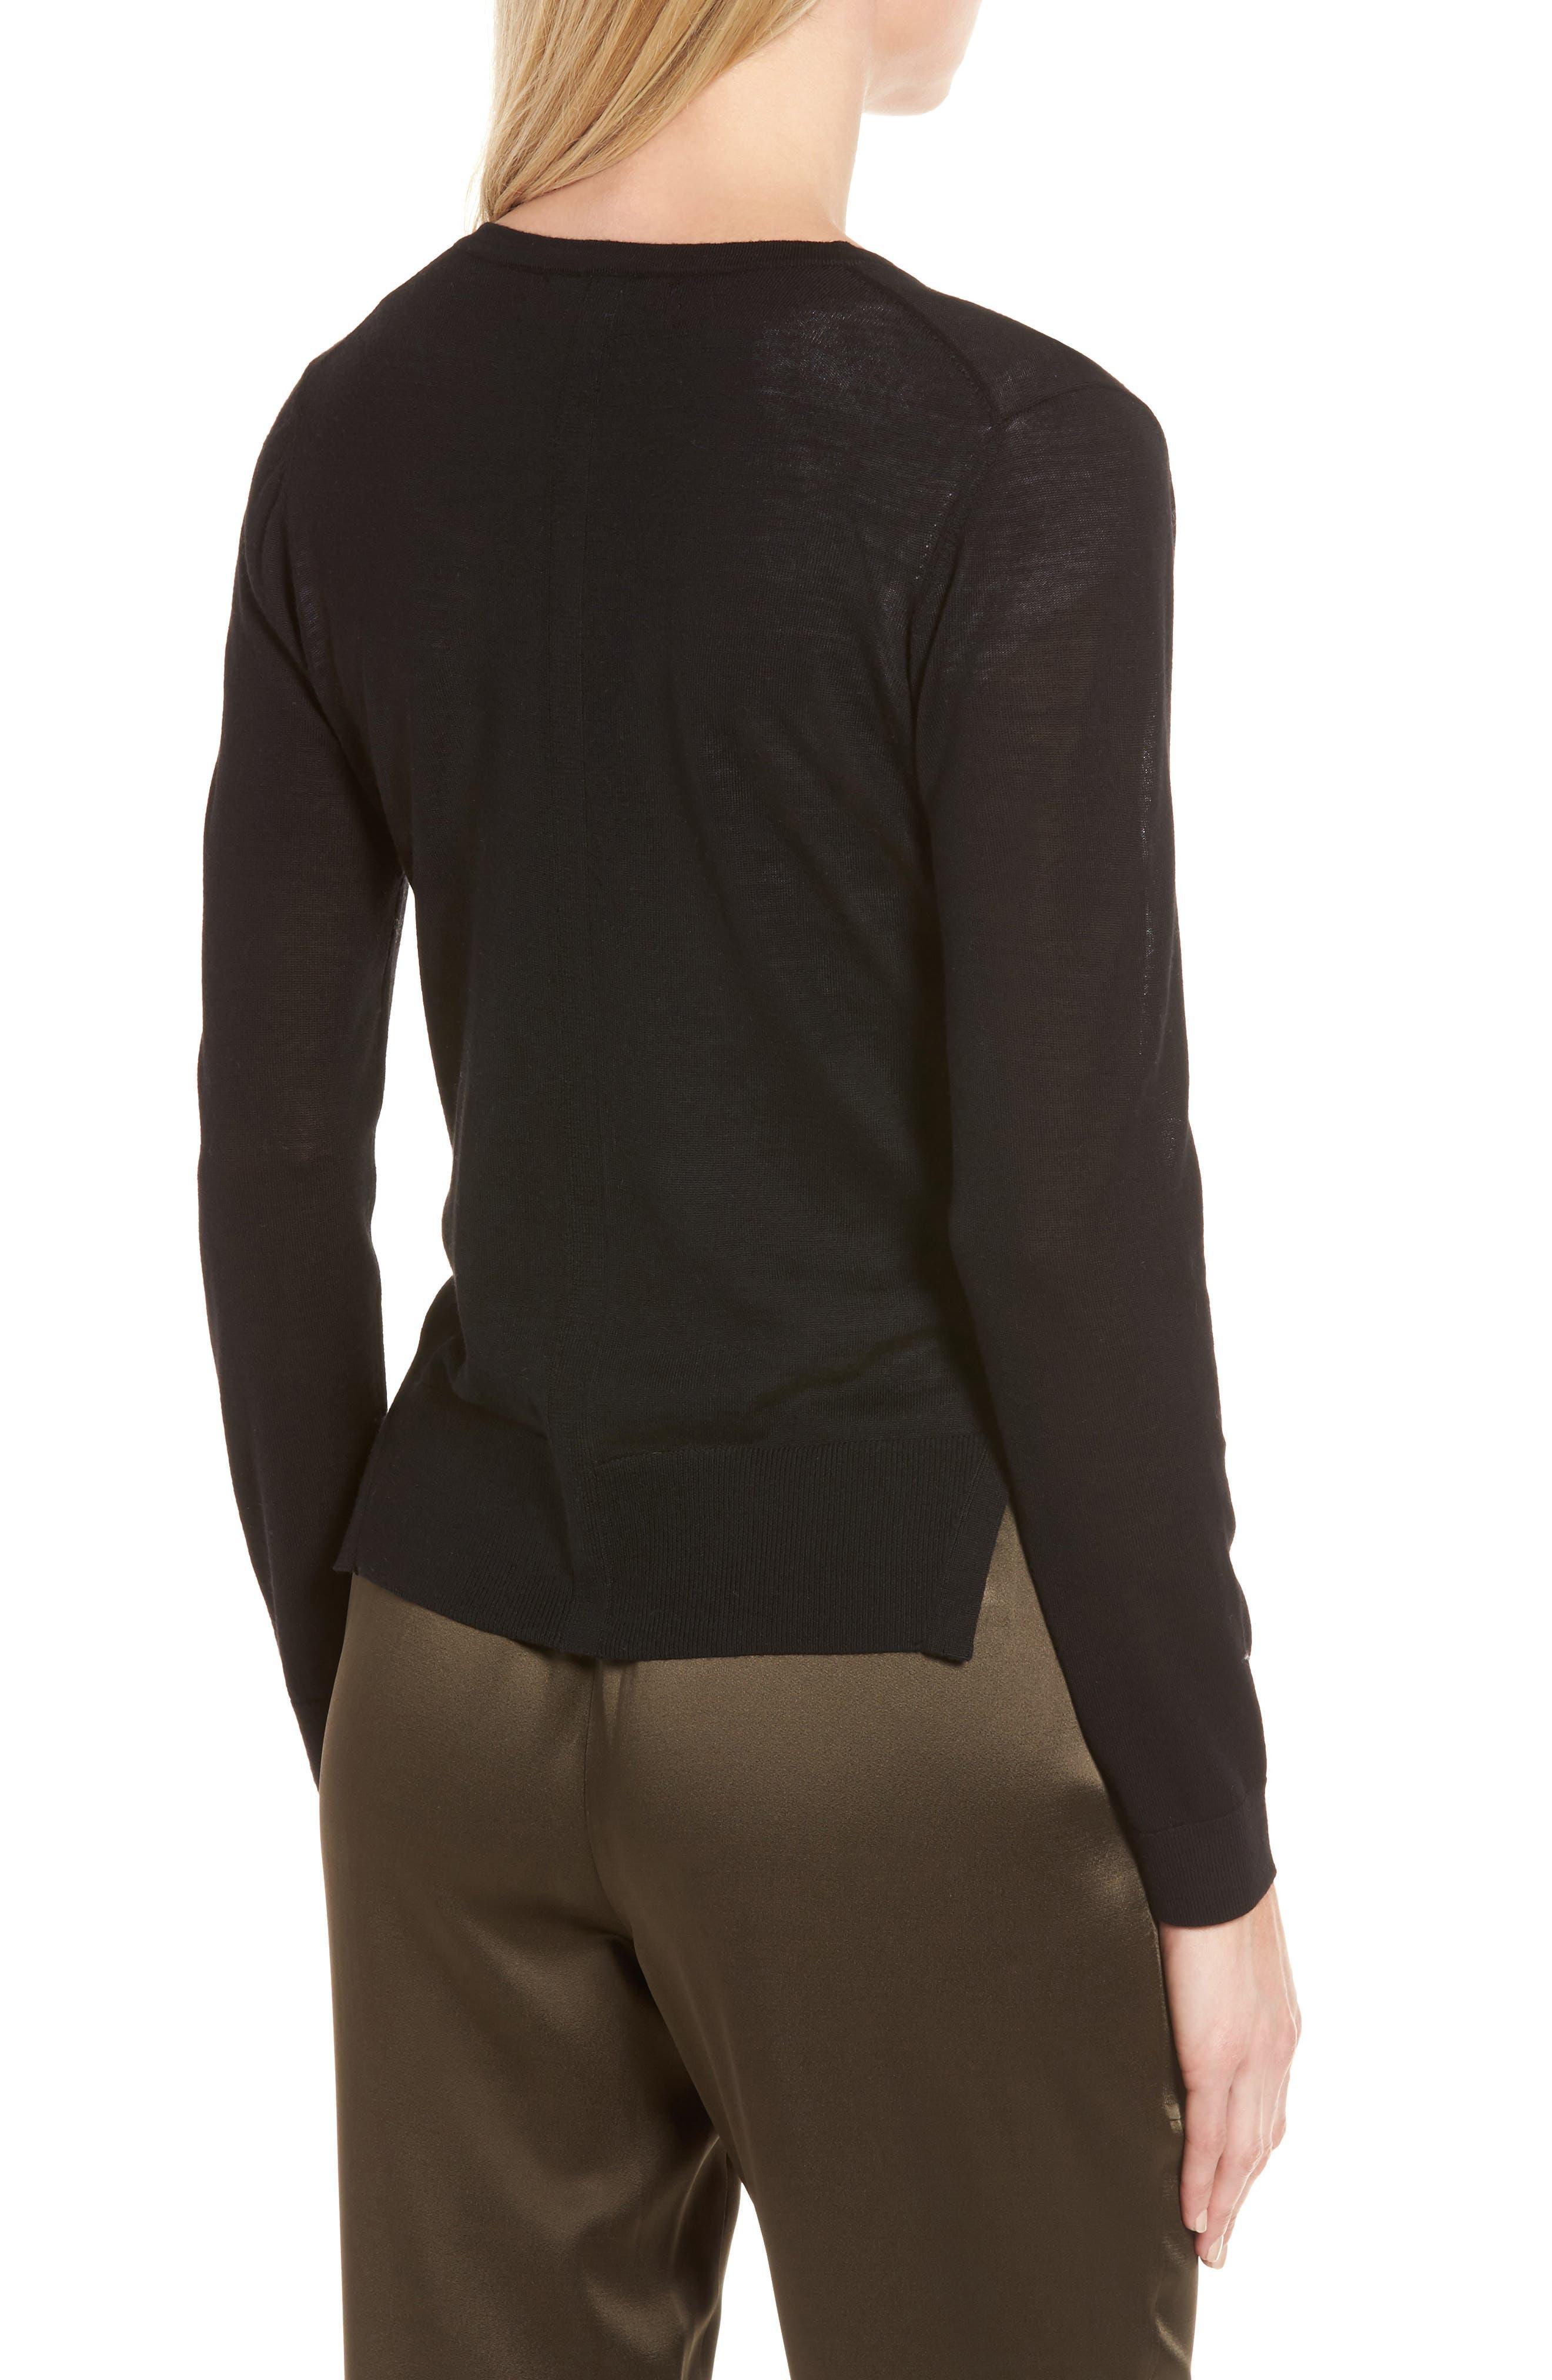 Italian Merino Wool Cardigan,                             Alternate thumbnail 2, color,                             Black